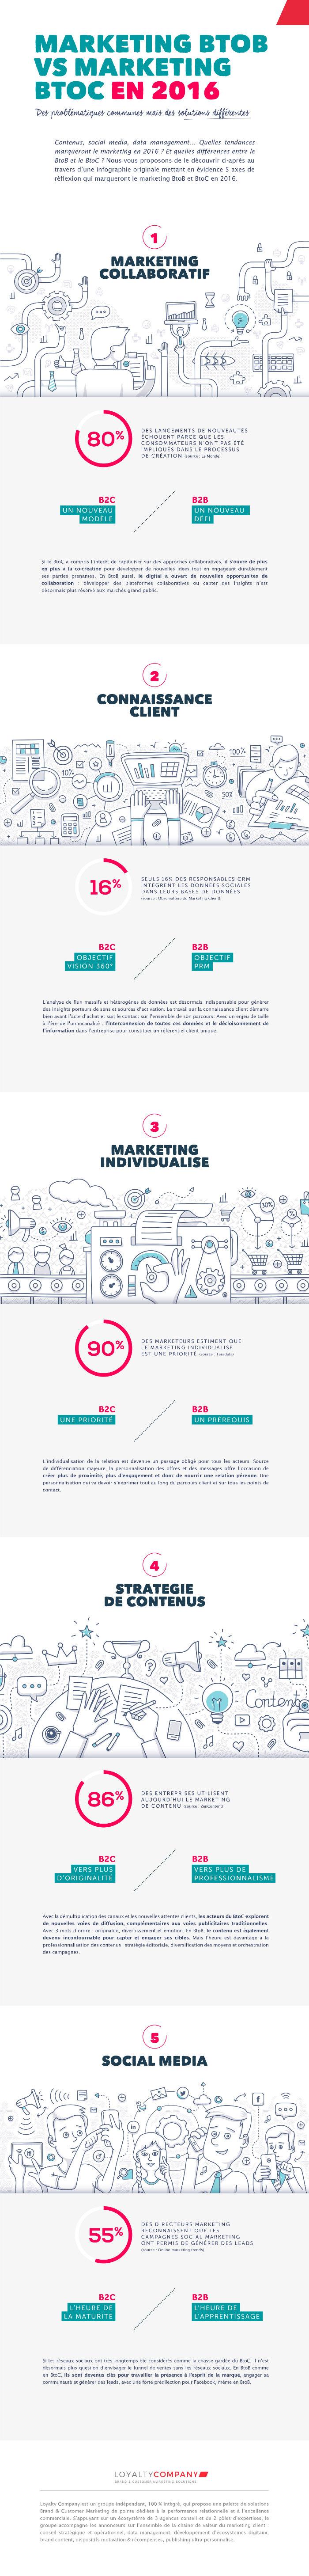 tendances-Marketing-BtoB-vs-BtoC